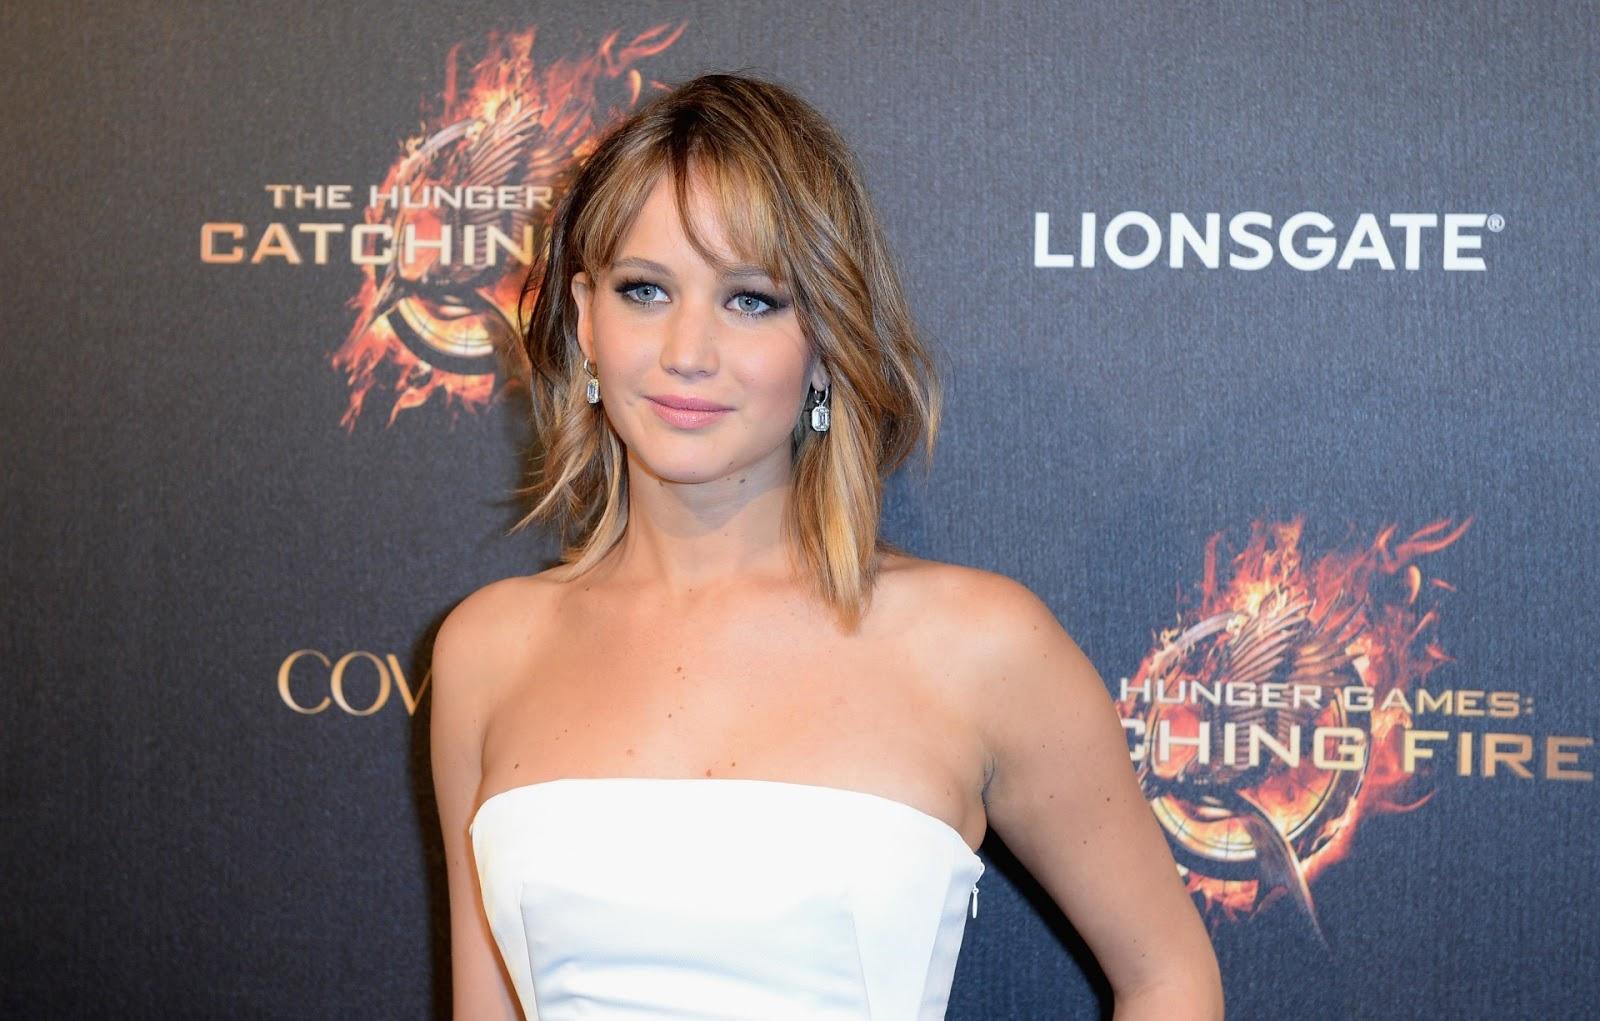 Jennifer Lawrence Hot Hd Photos  Wallpaper - Hd Images -7506